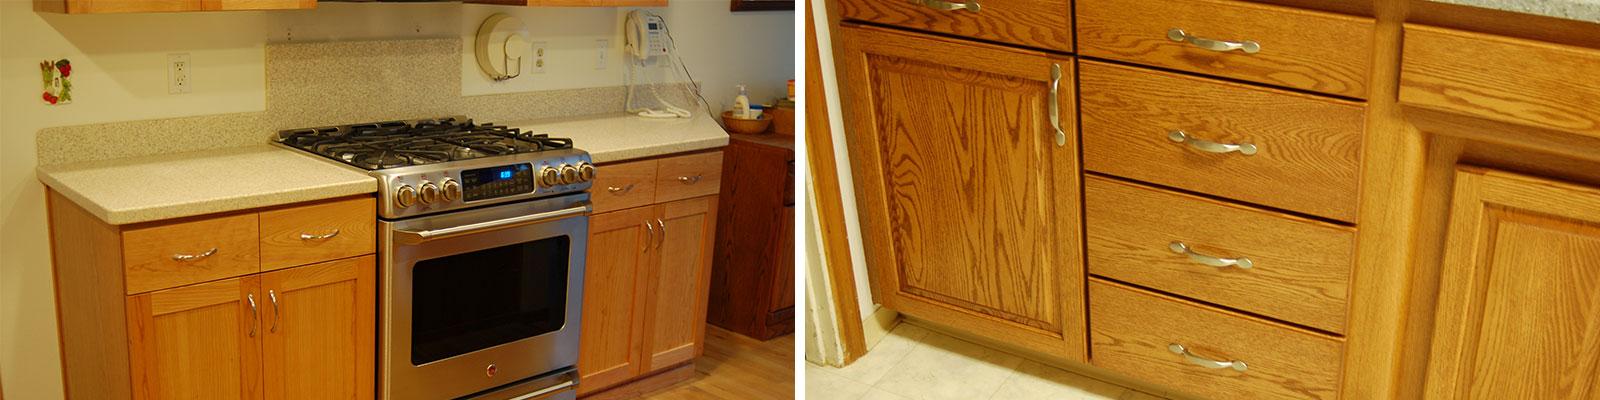 Kitchen Cabinet Refacing Kitchen And Bathroom Renovation Remodel